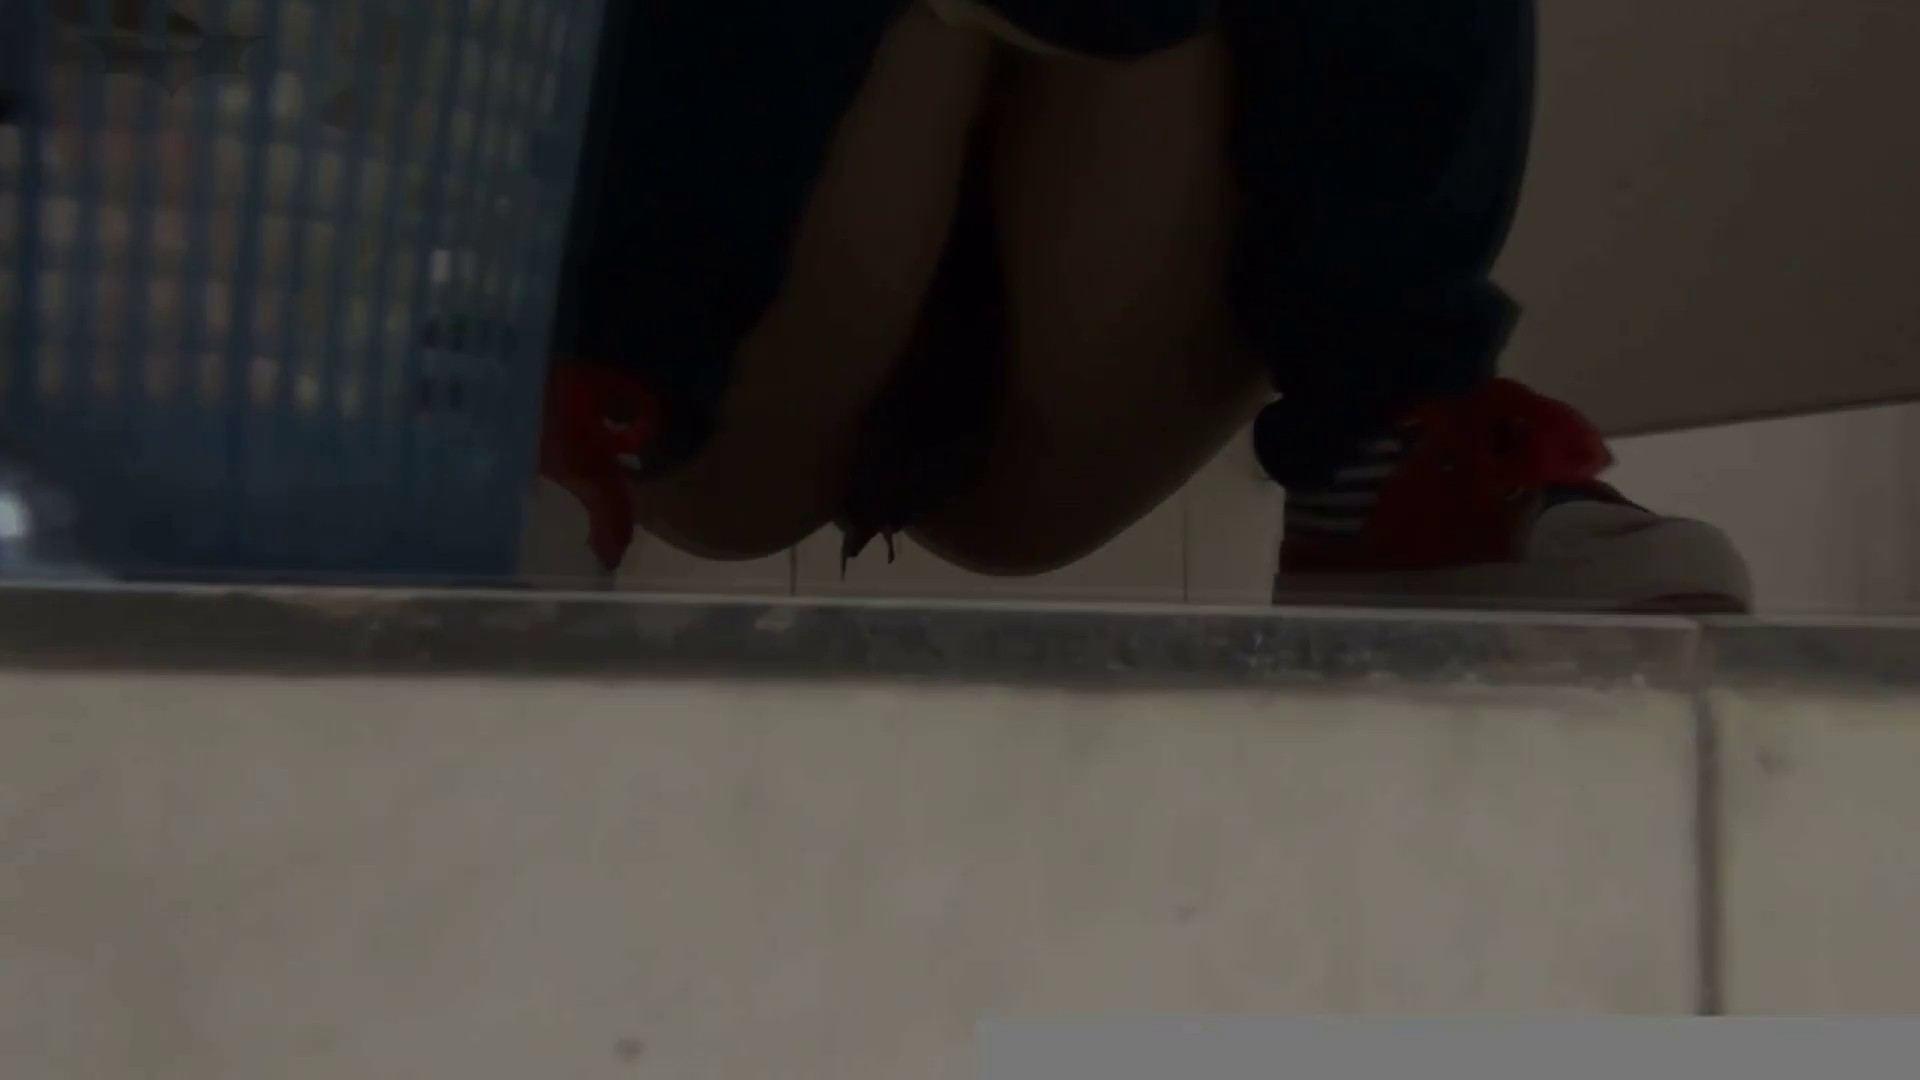 JD盗撮 美女の洗面所の秘密 Vol.20 盗撮映像大放出 AV無料 98連発 48